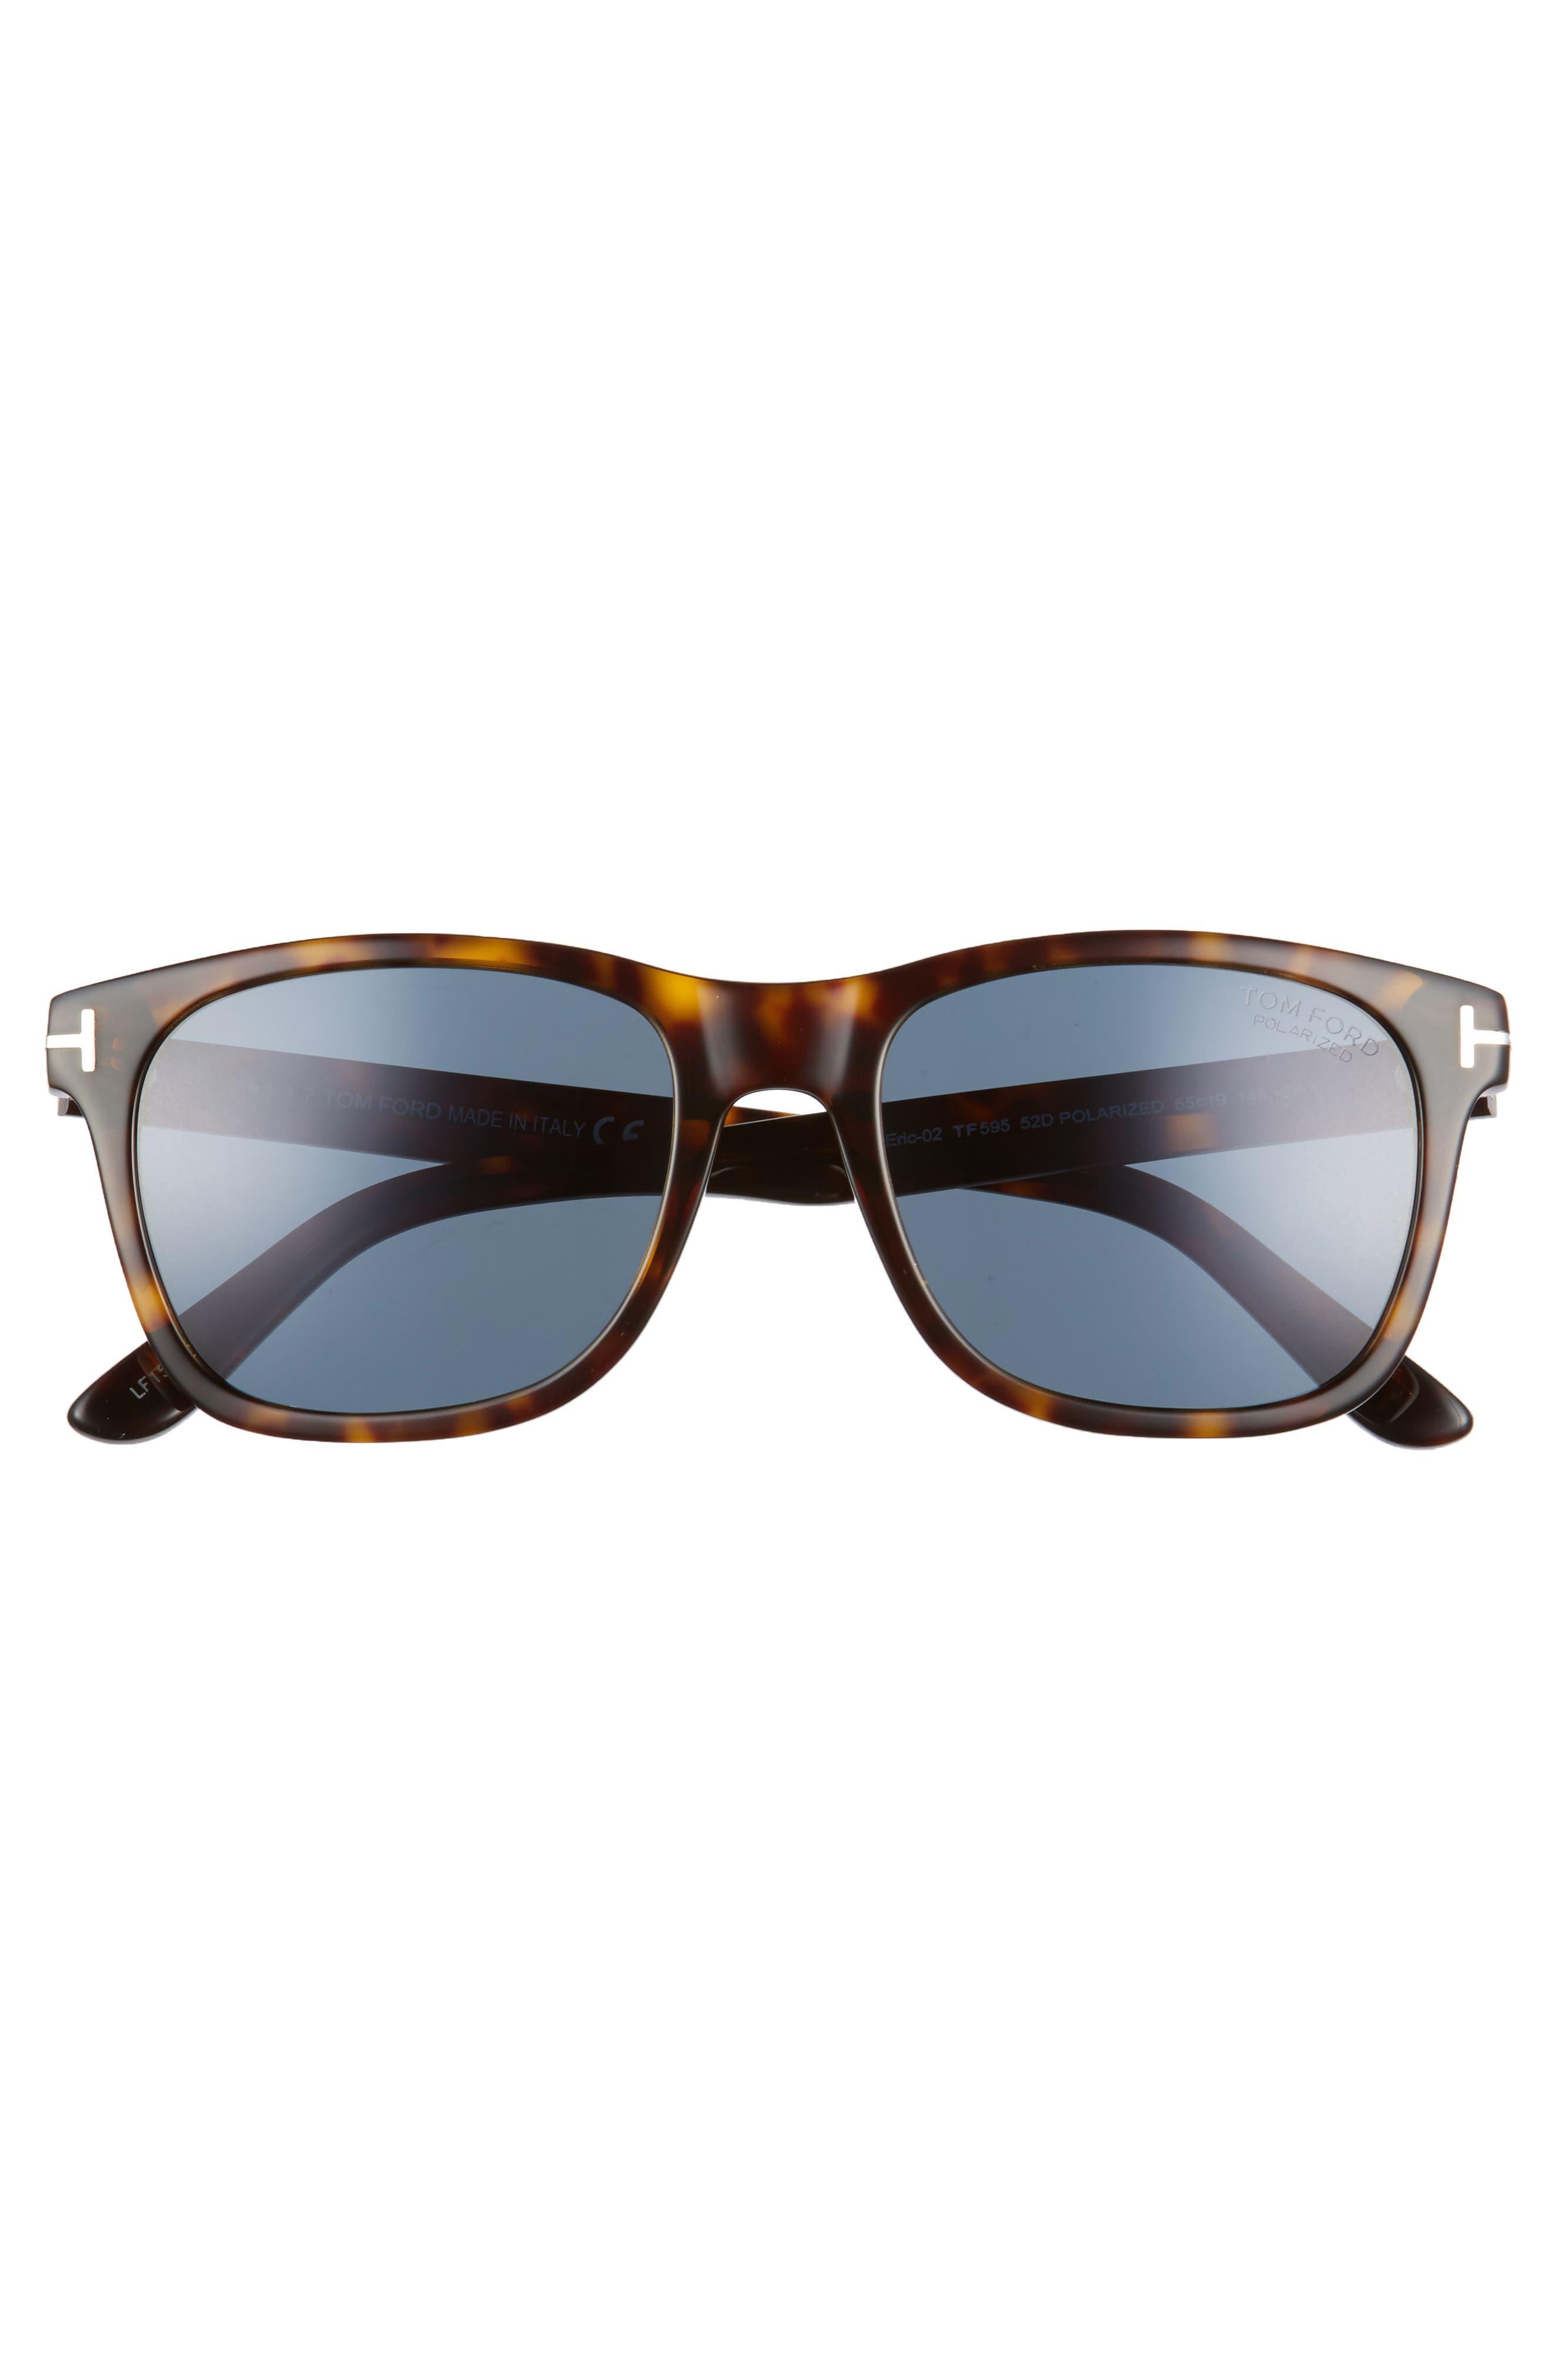 Eric 55mm Polarized Sunglasses,                             Alternate thumbnail 2, color,                             200